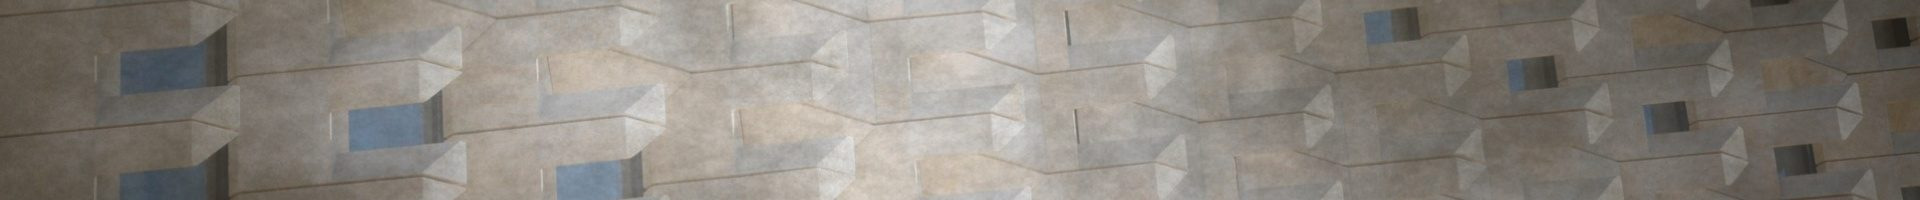 e3d_cloudy_high_res-wallpaper-1920x1080